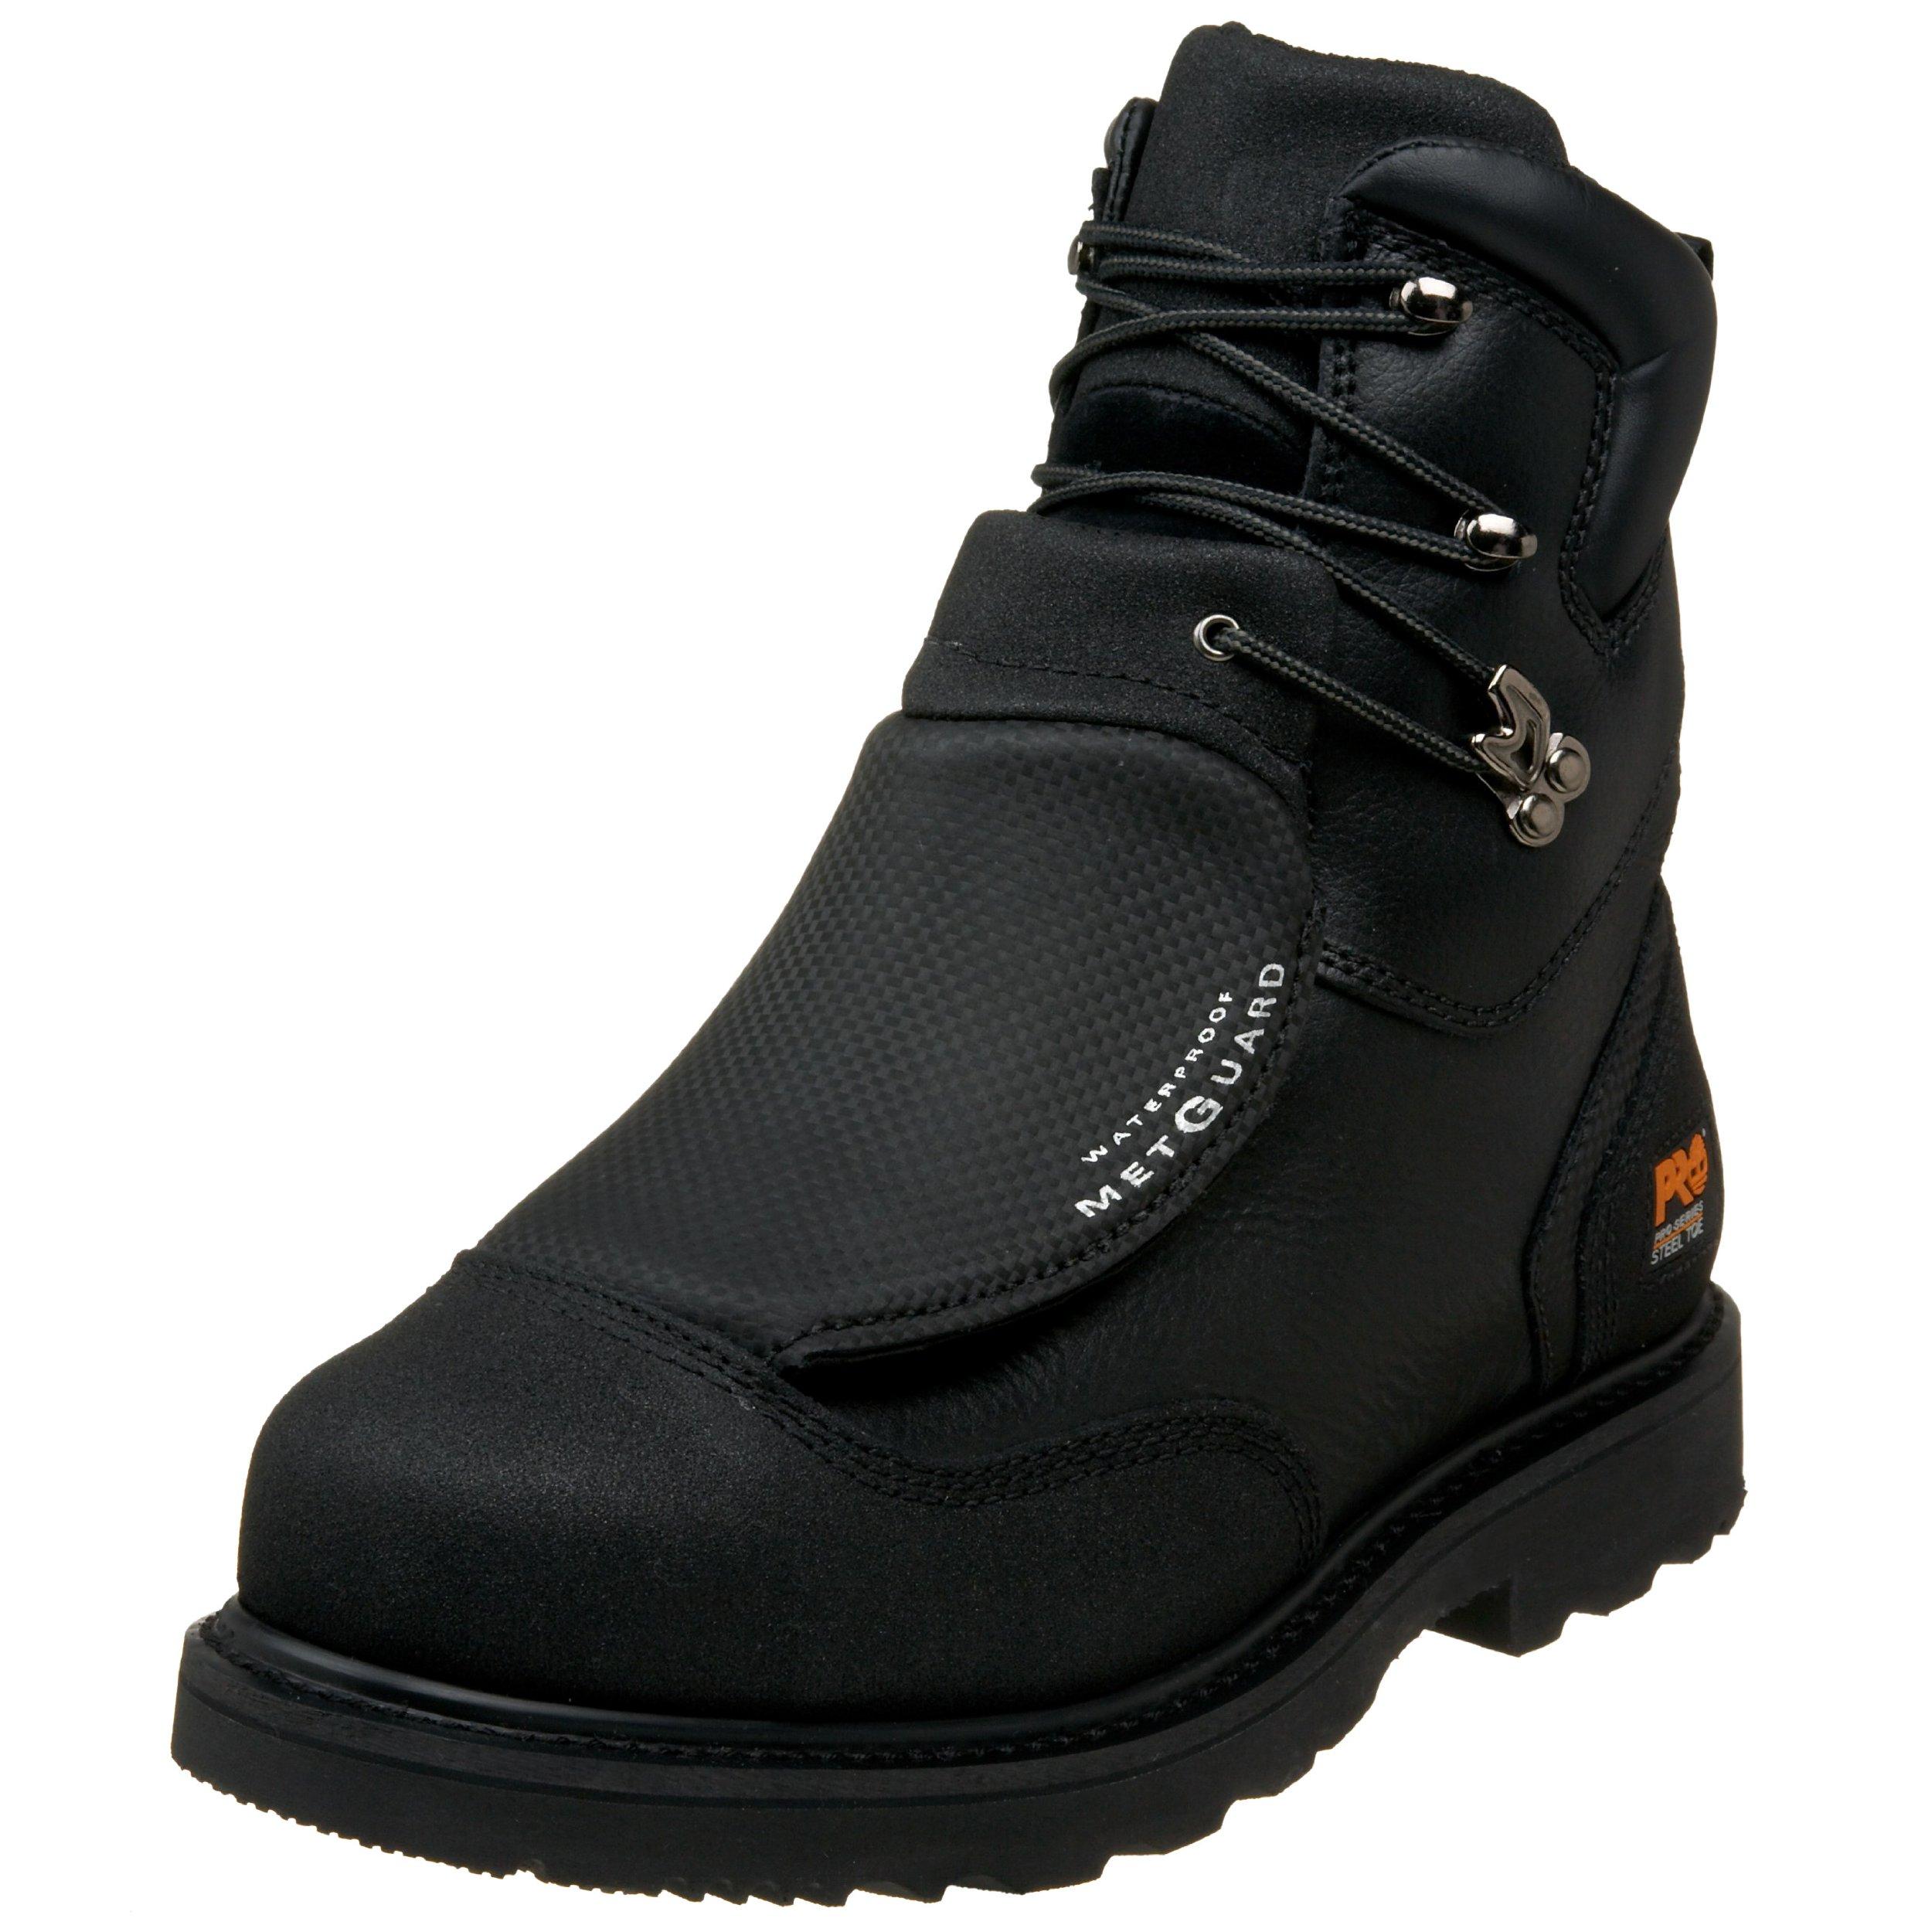 Timberland PRO Men's 53530 8'' Metguard Steel-Toe Boot,Black,15 W